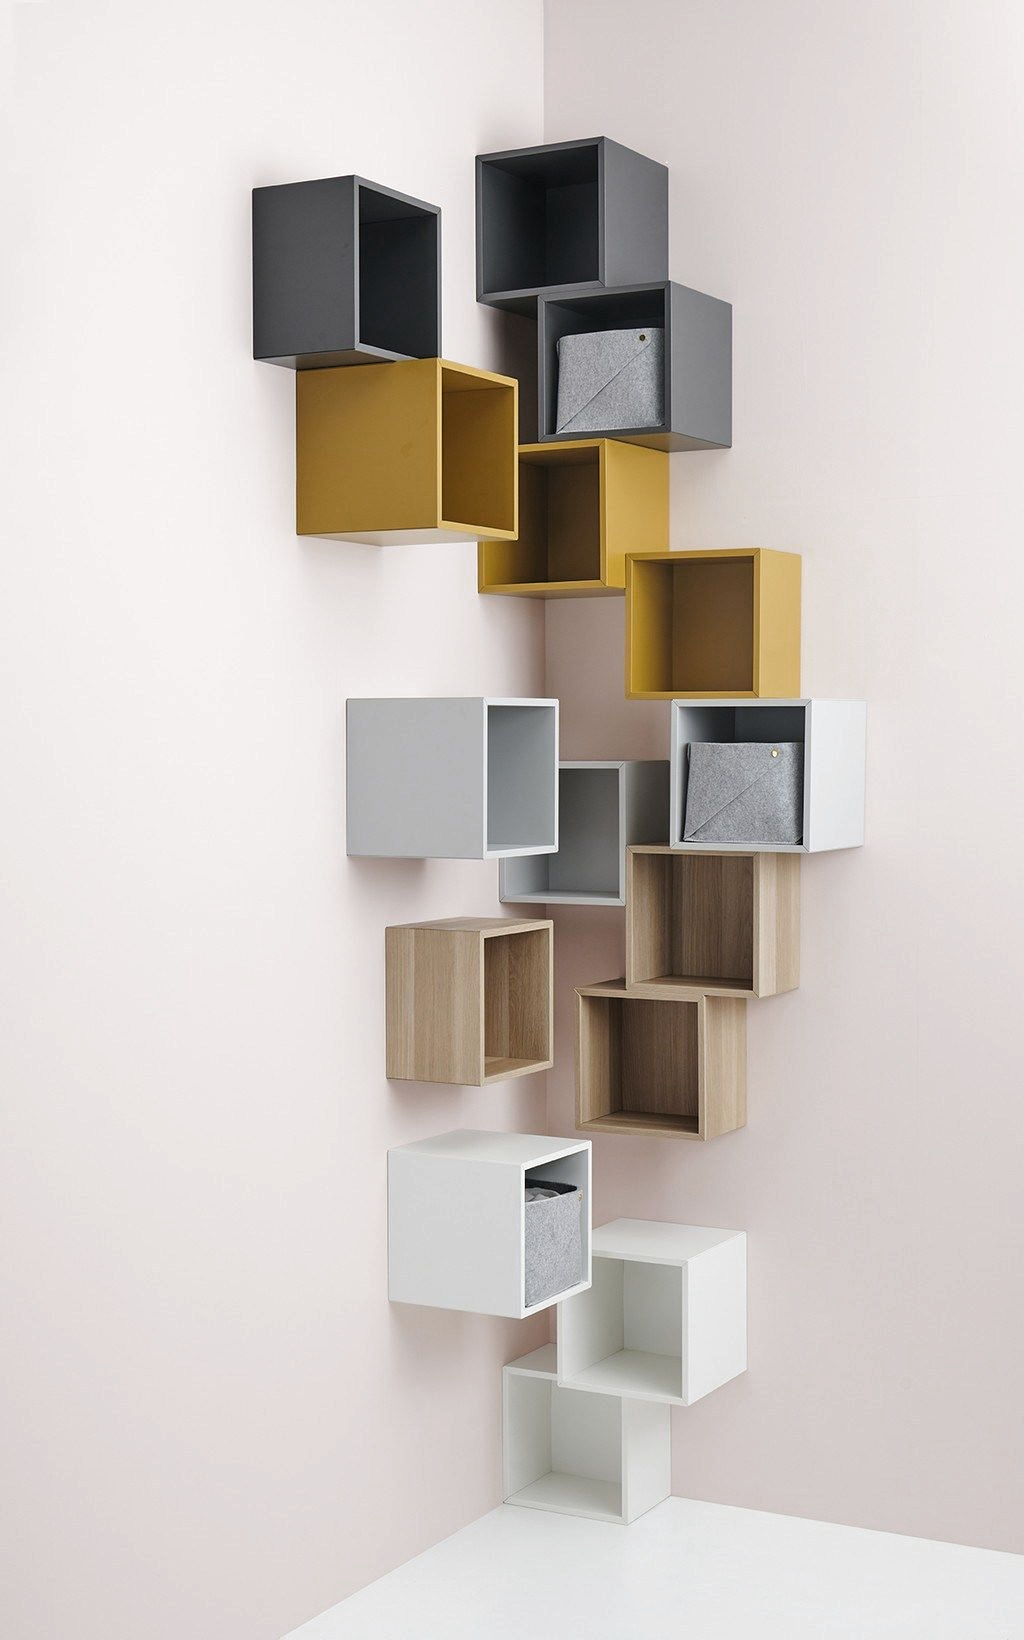 Les Premieres Images Du Catalogue Ikea 2020 Edition Daout Planete Deco A Homes World In 2020 Eket Ikea Living Room Decor